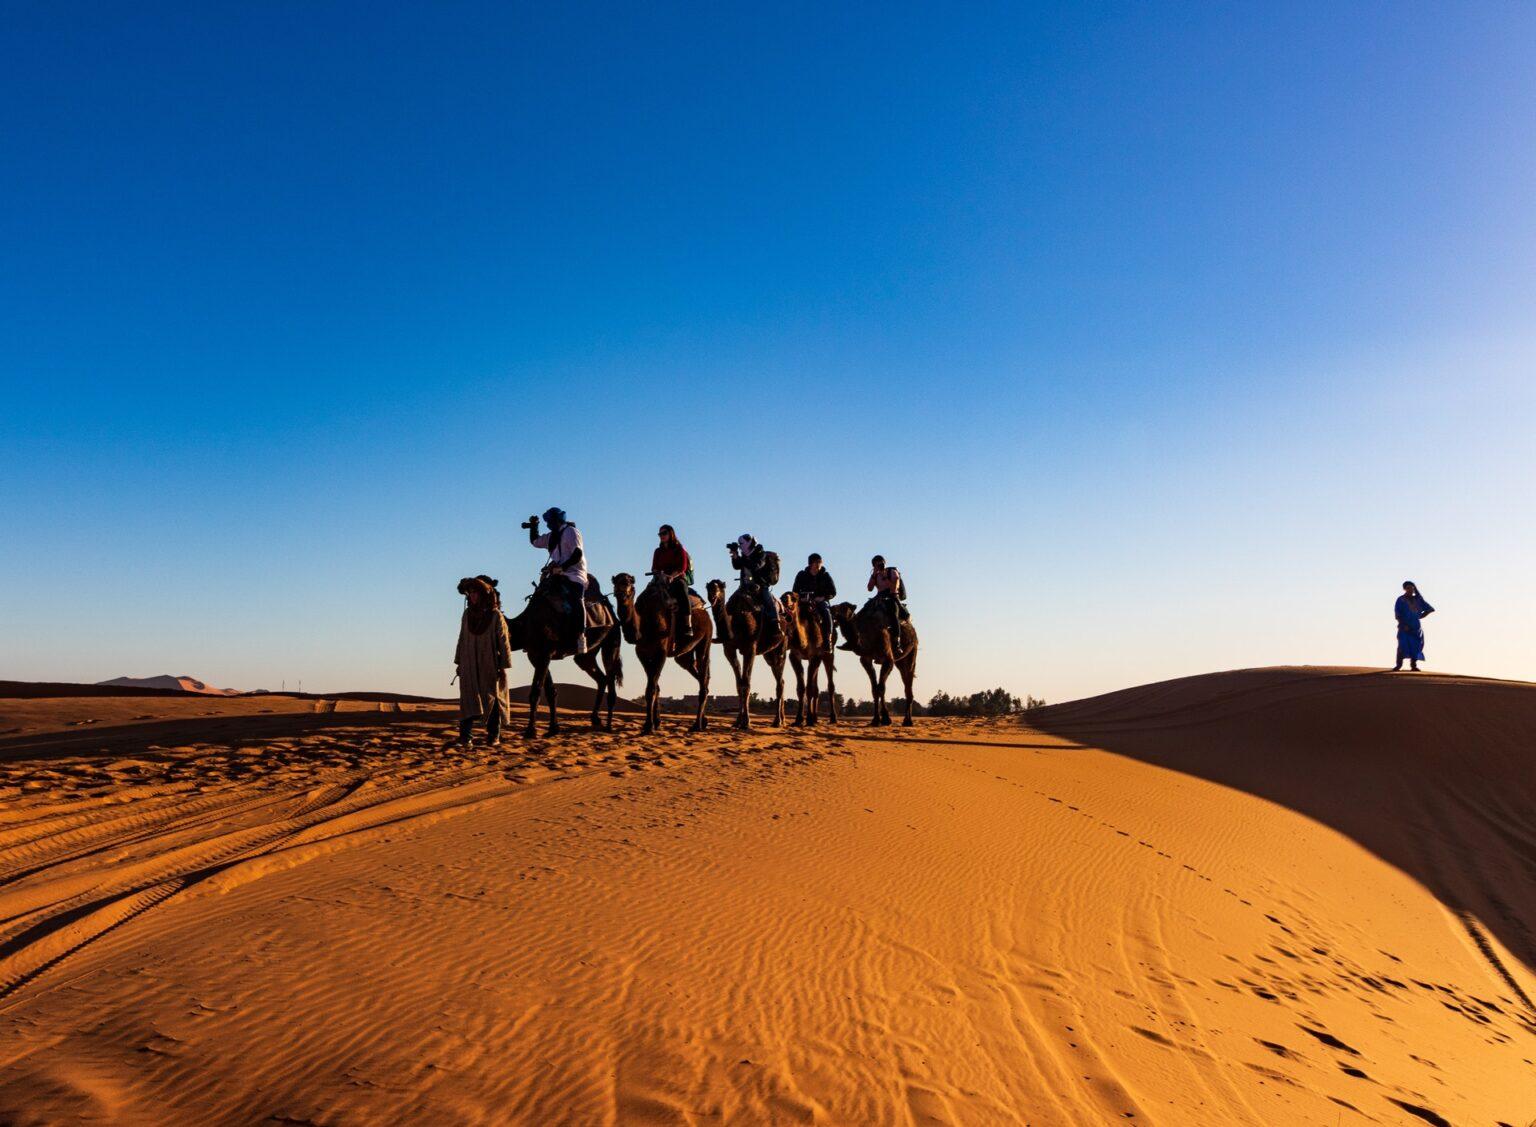 pexels tomáš malík 1703312 1536x1127 - Guide Morocco Tours